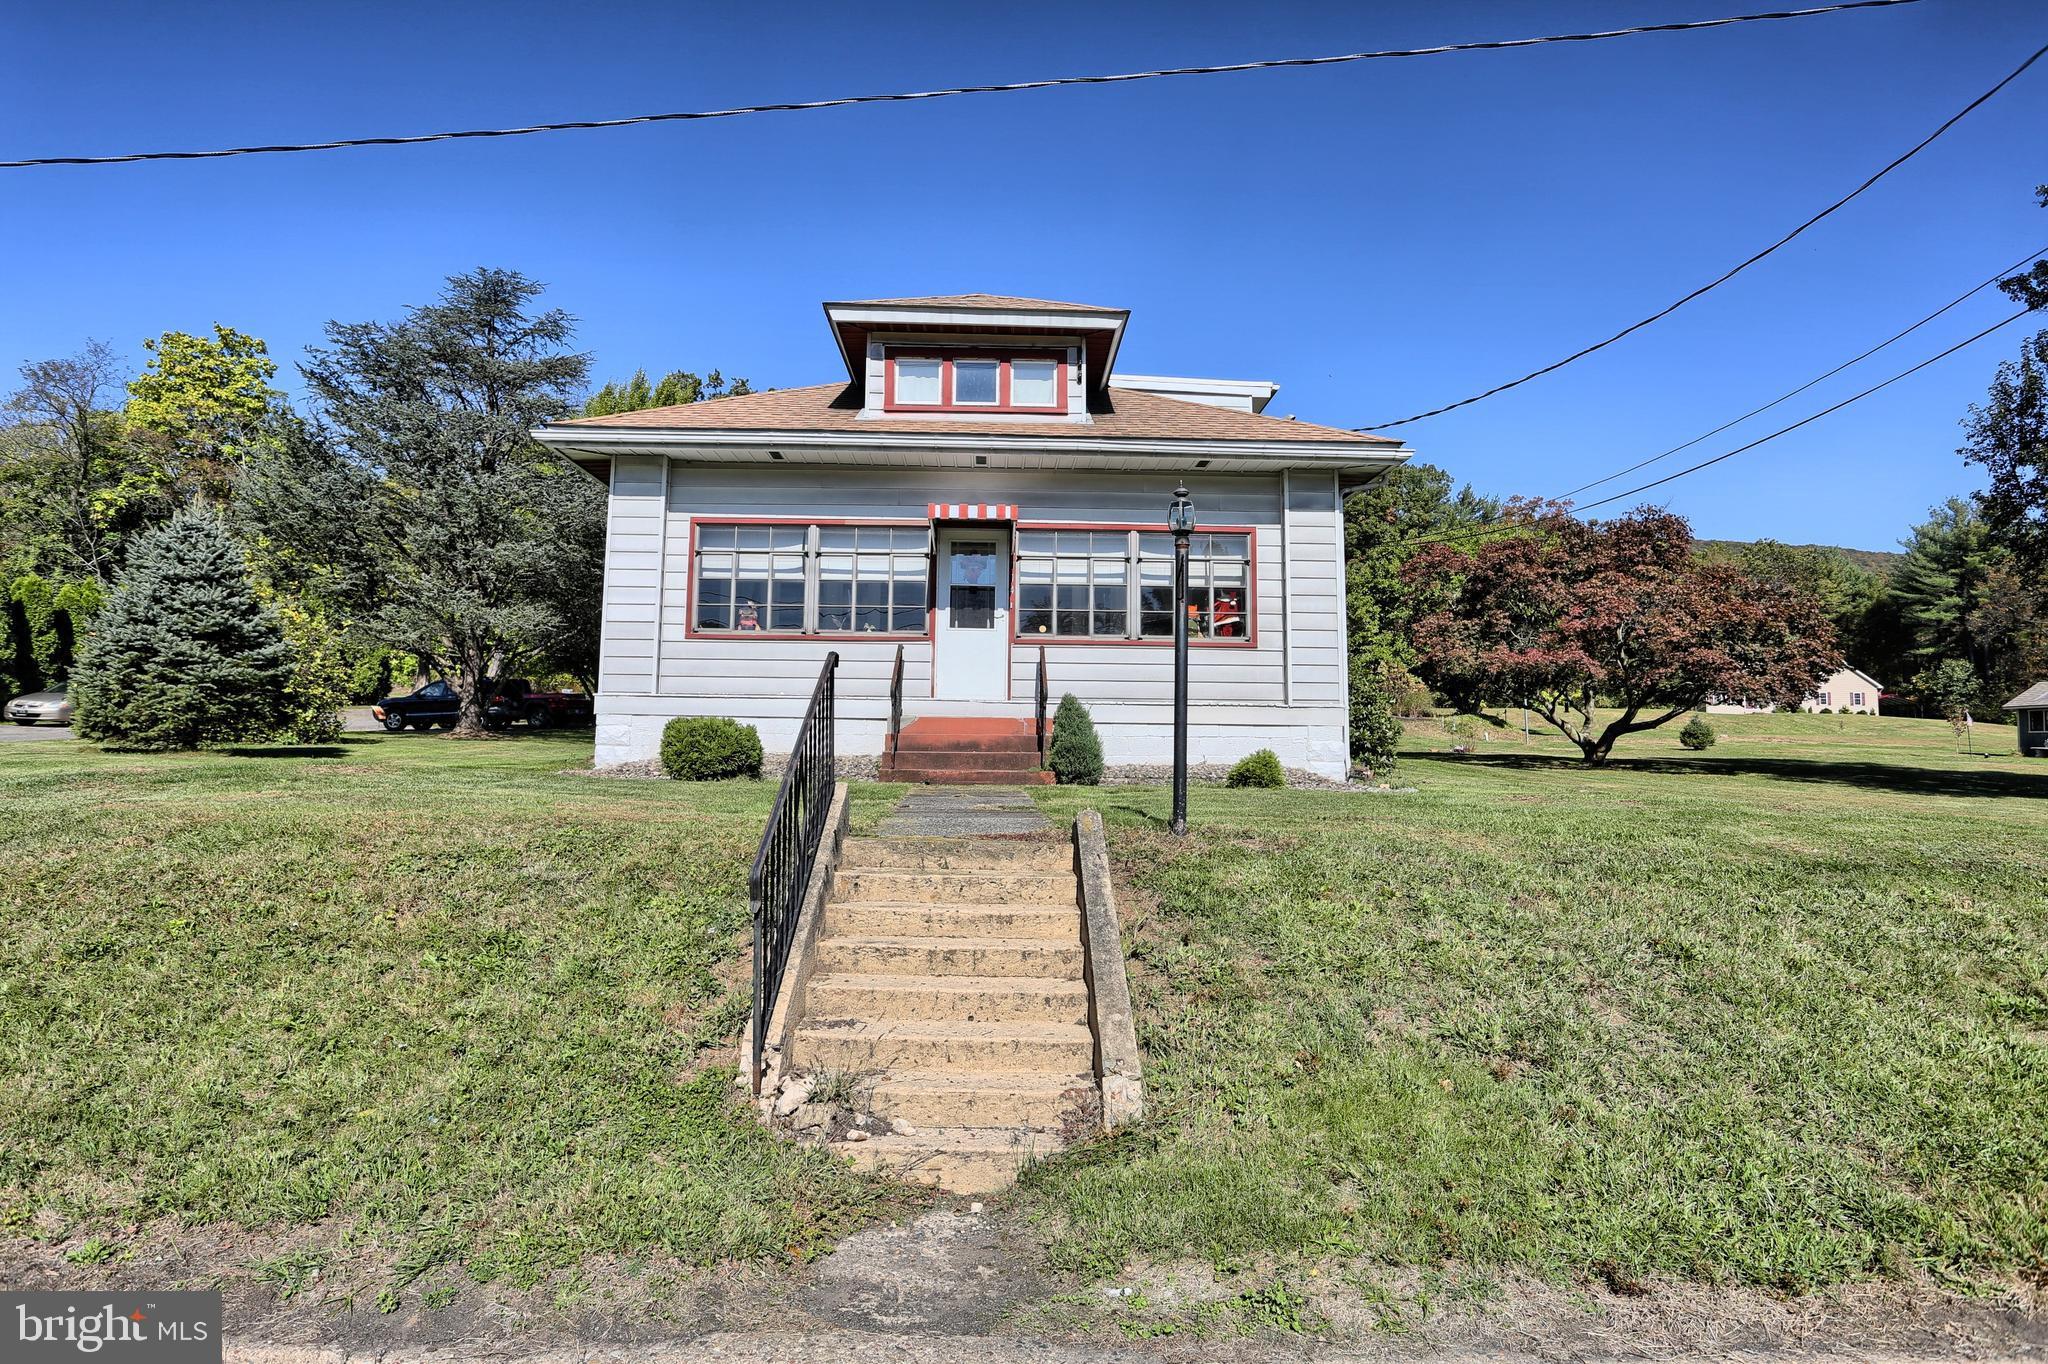 714 POTTSVILLE ST, WICONISCO, PA 17097